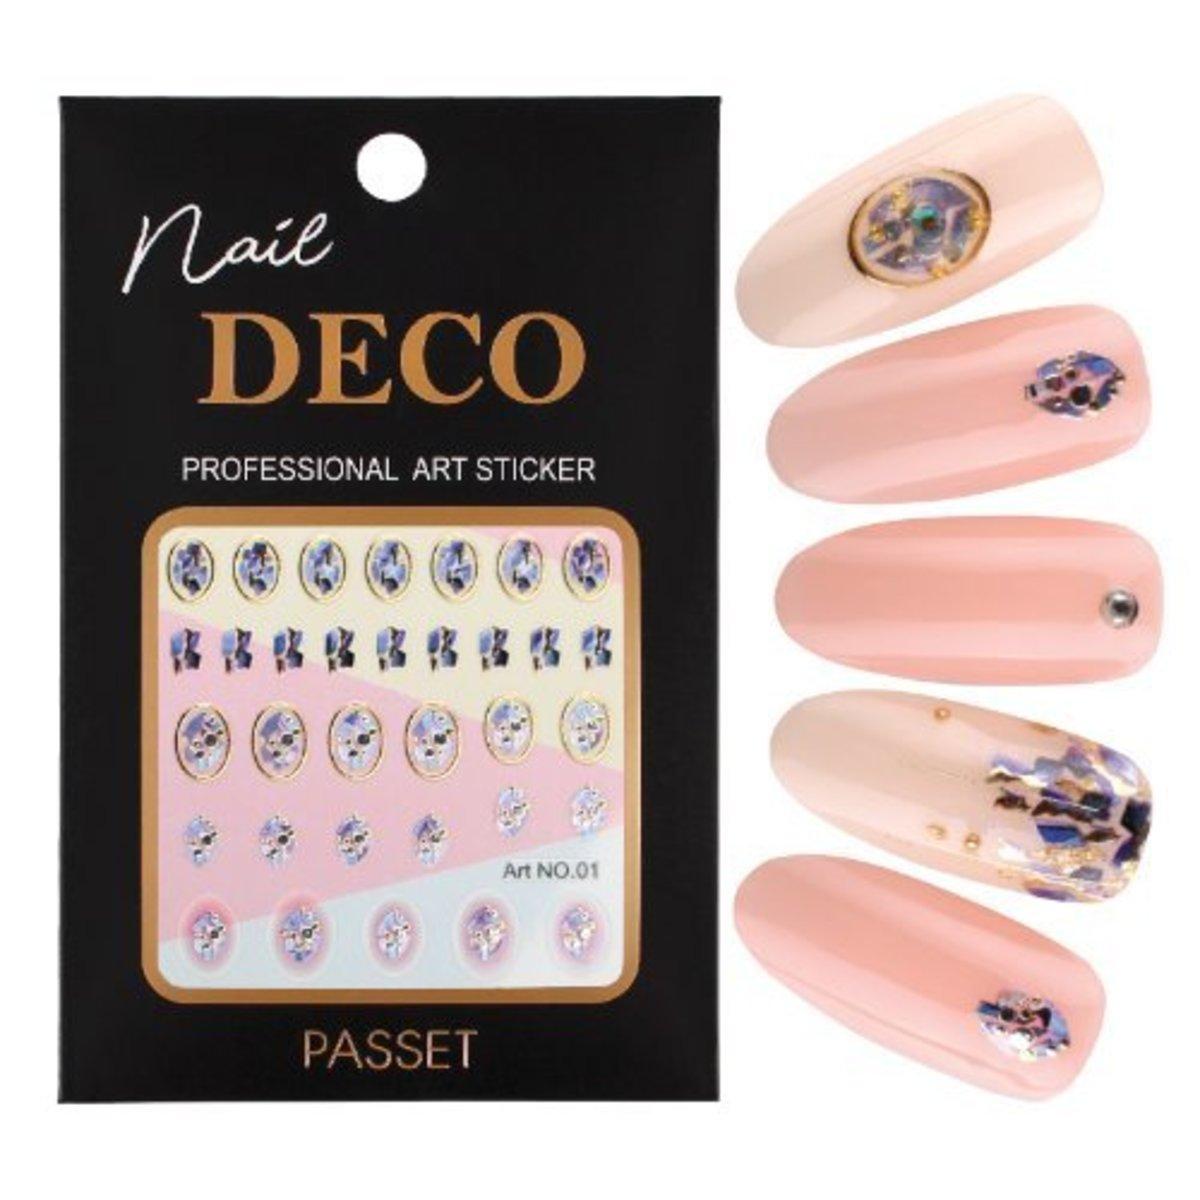 Passet Nail Deco Art Sticker No. 01